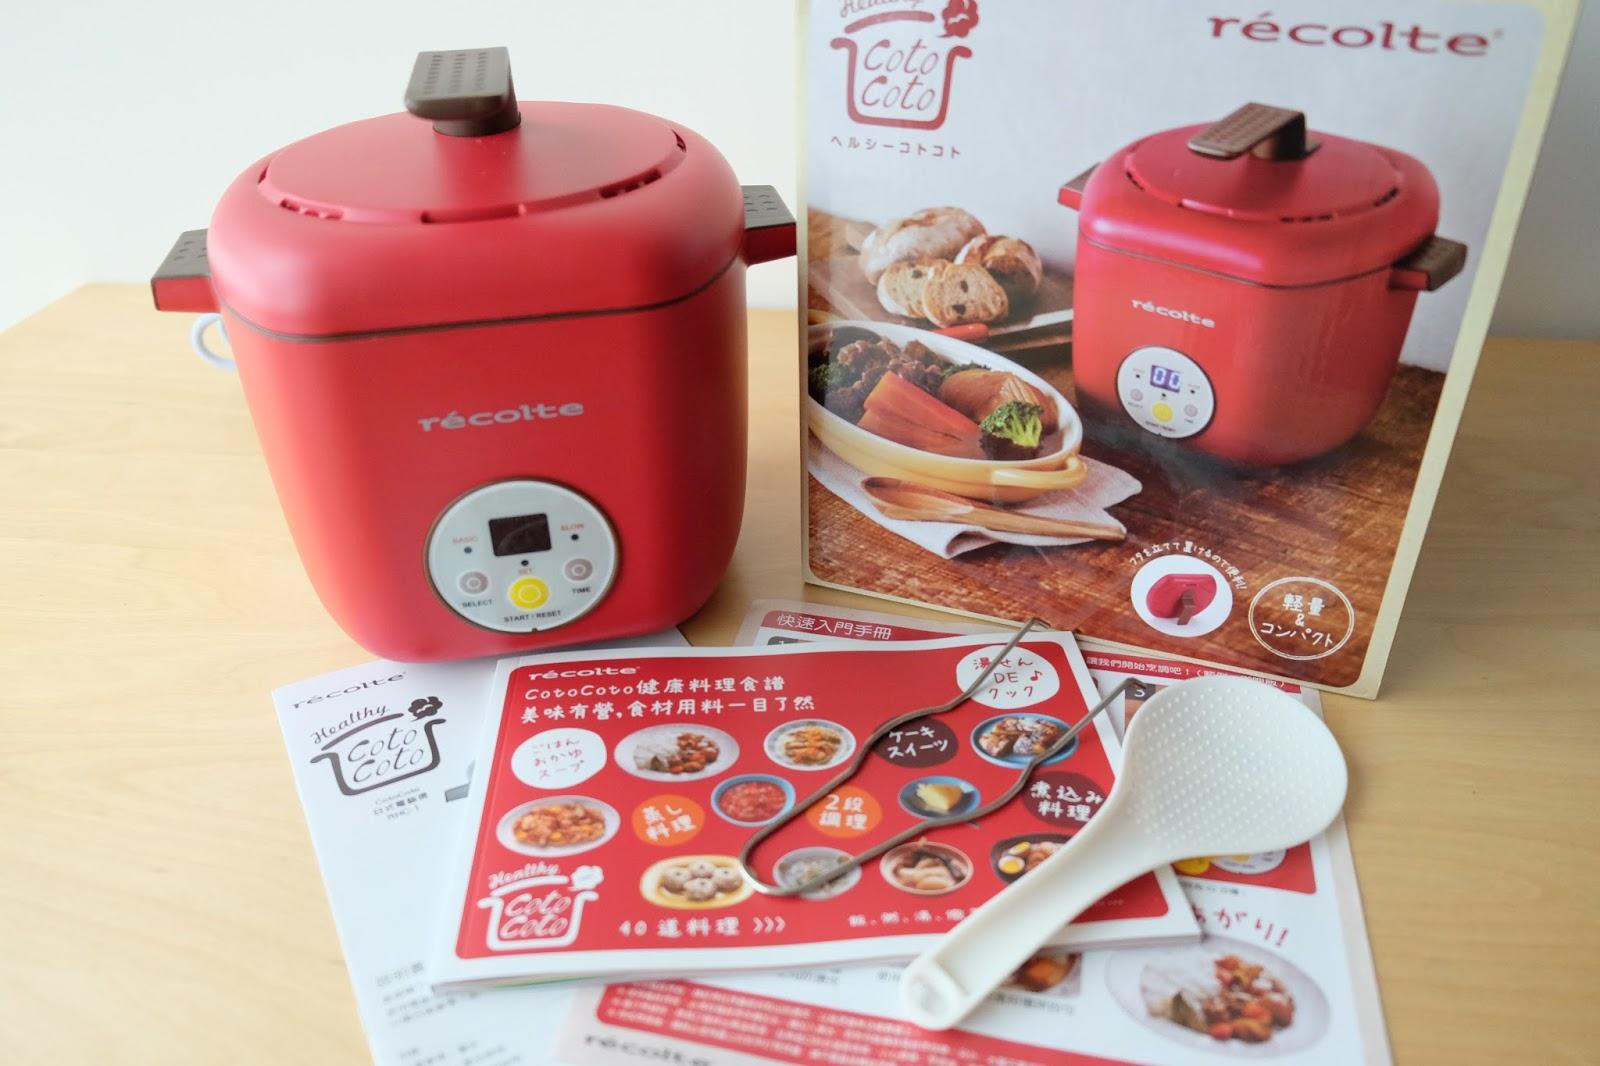 Missta's Kitchen: Recolte Healthy CotoCoto ~ 日式電飯煲 (開箱文附食譜)